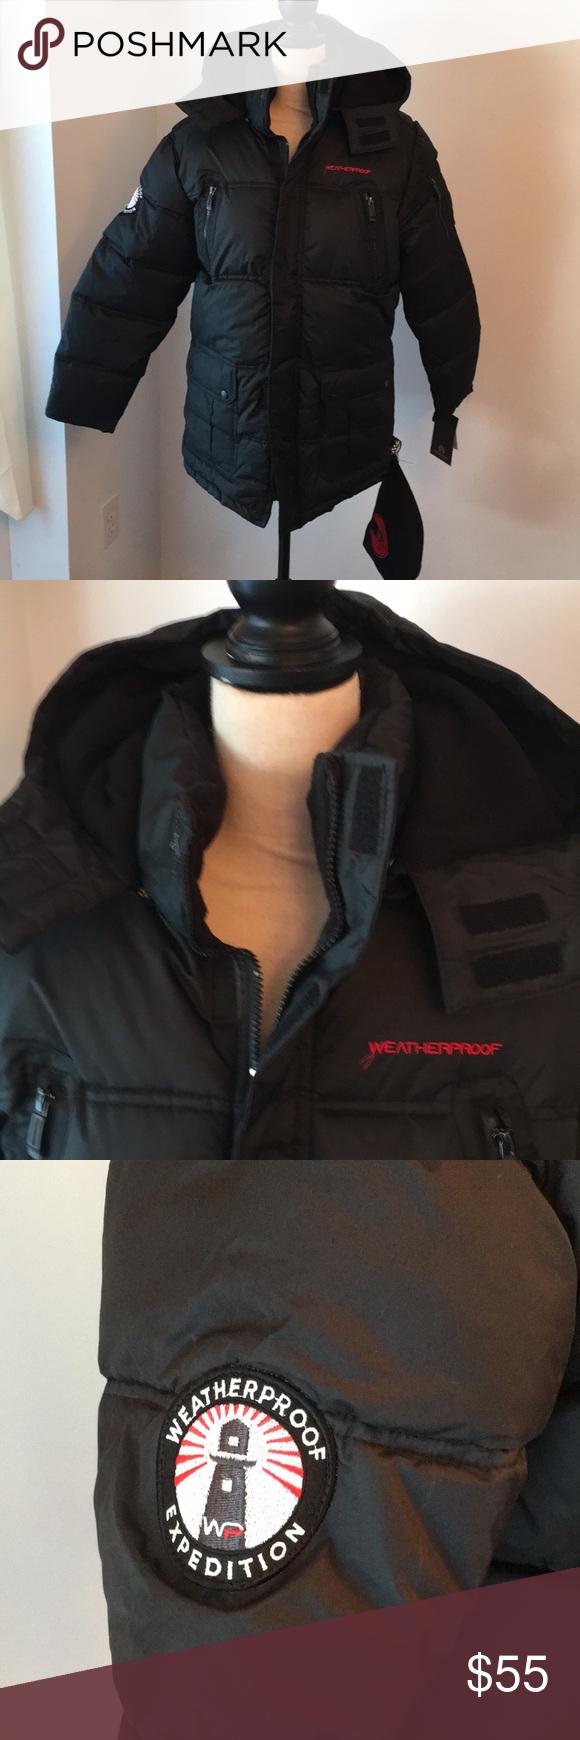 Nwt Weatherproof Boys 14 16 Large Jacket Hp Weatherproof Jacket Clothes Design Jackets [ 1740 x 580 Pixel ]